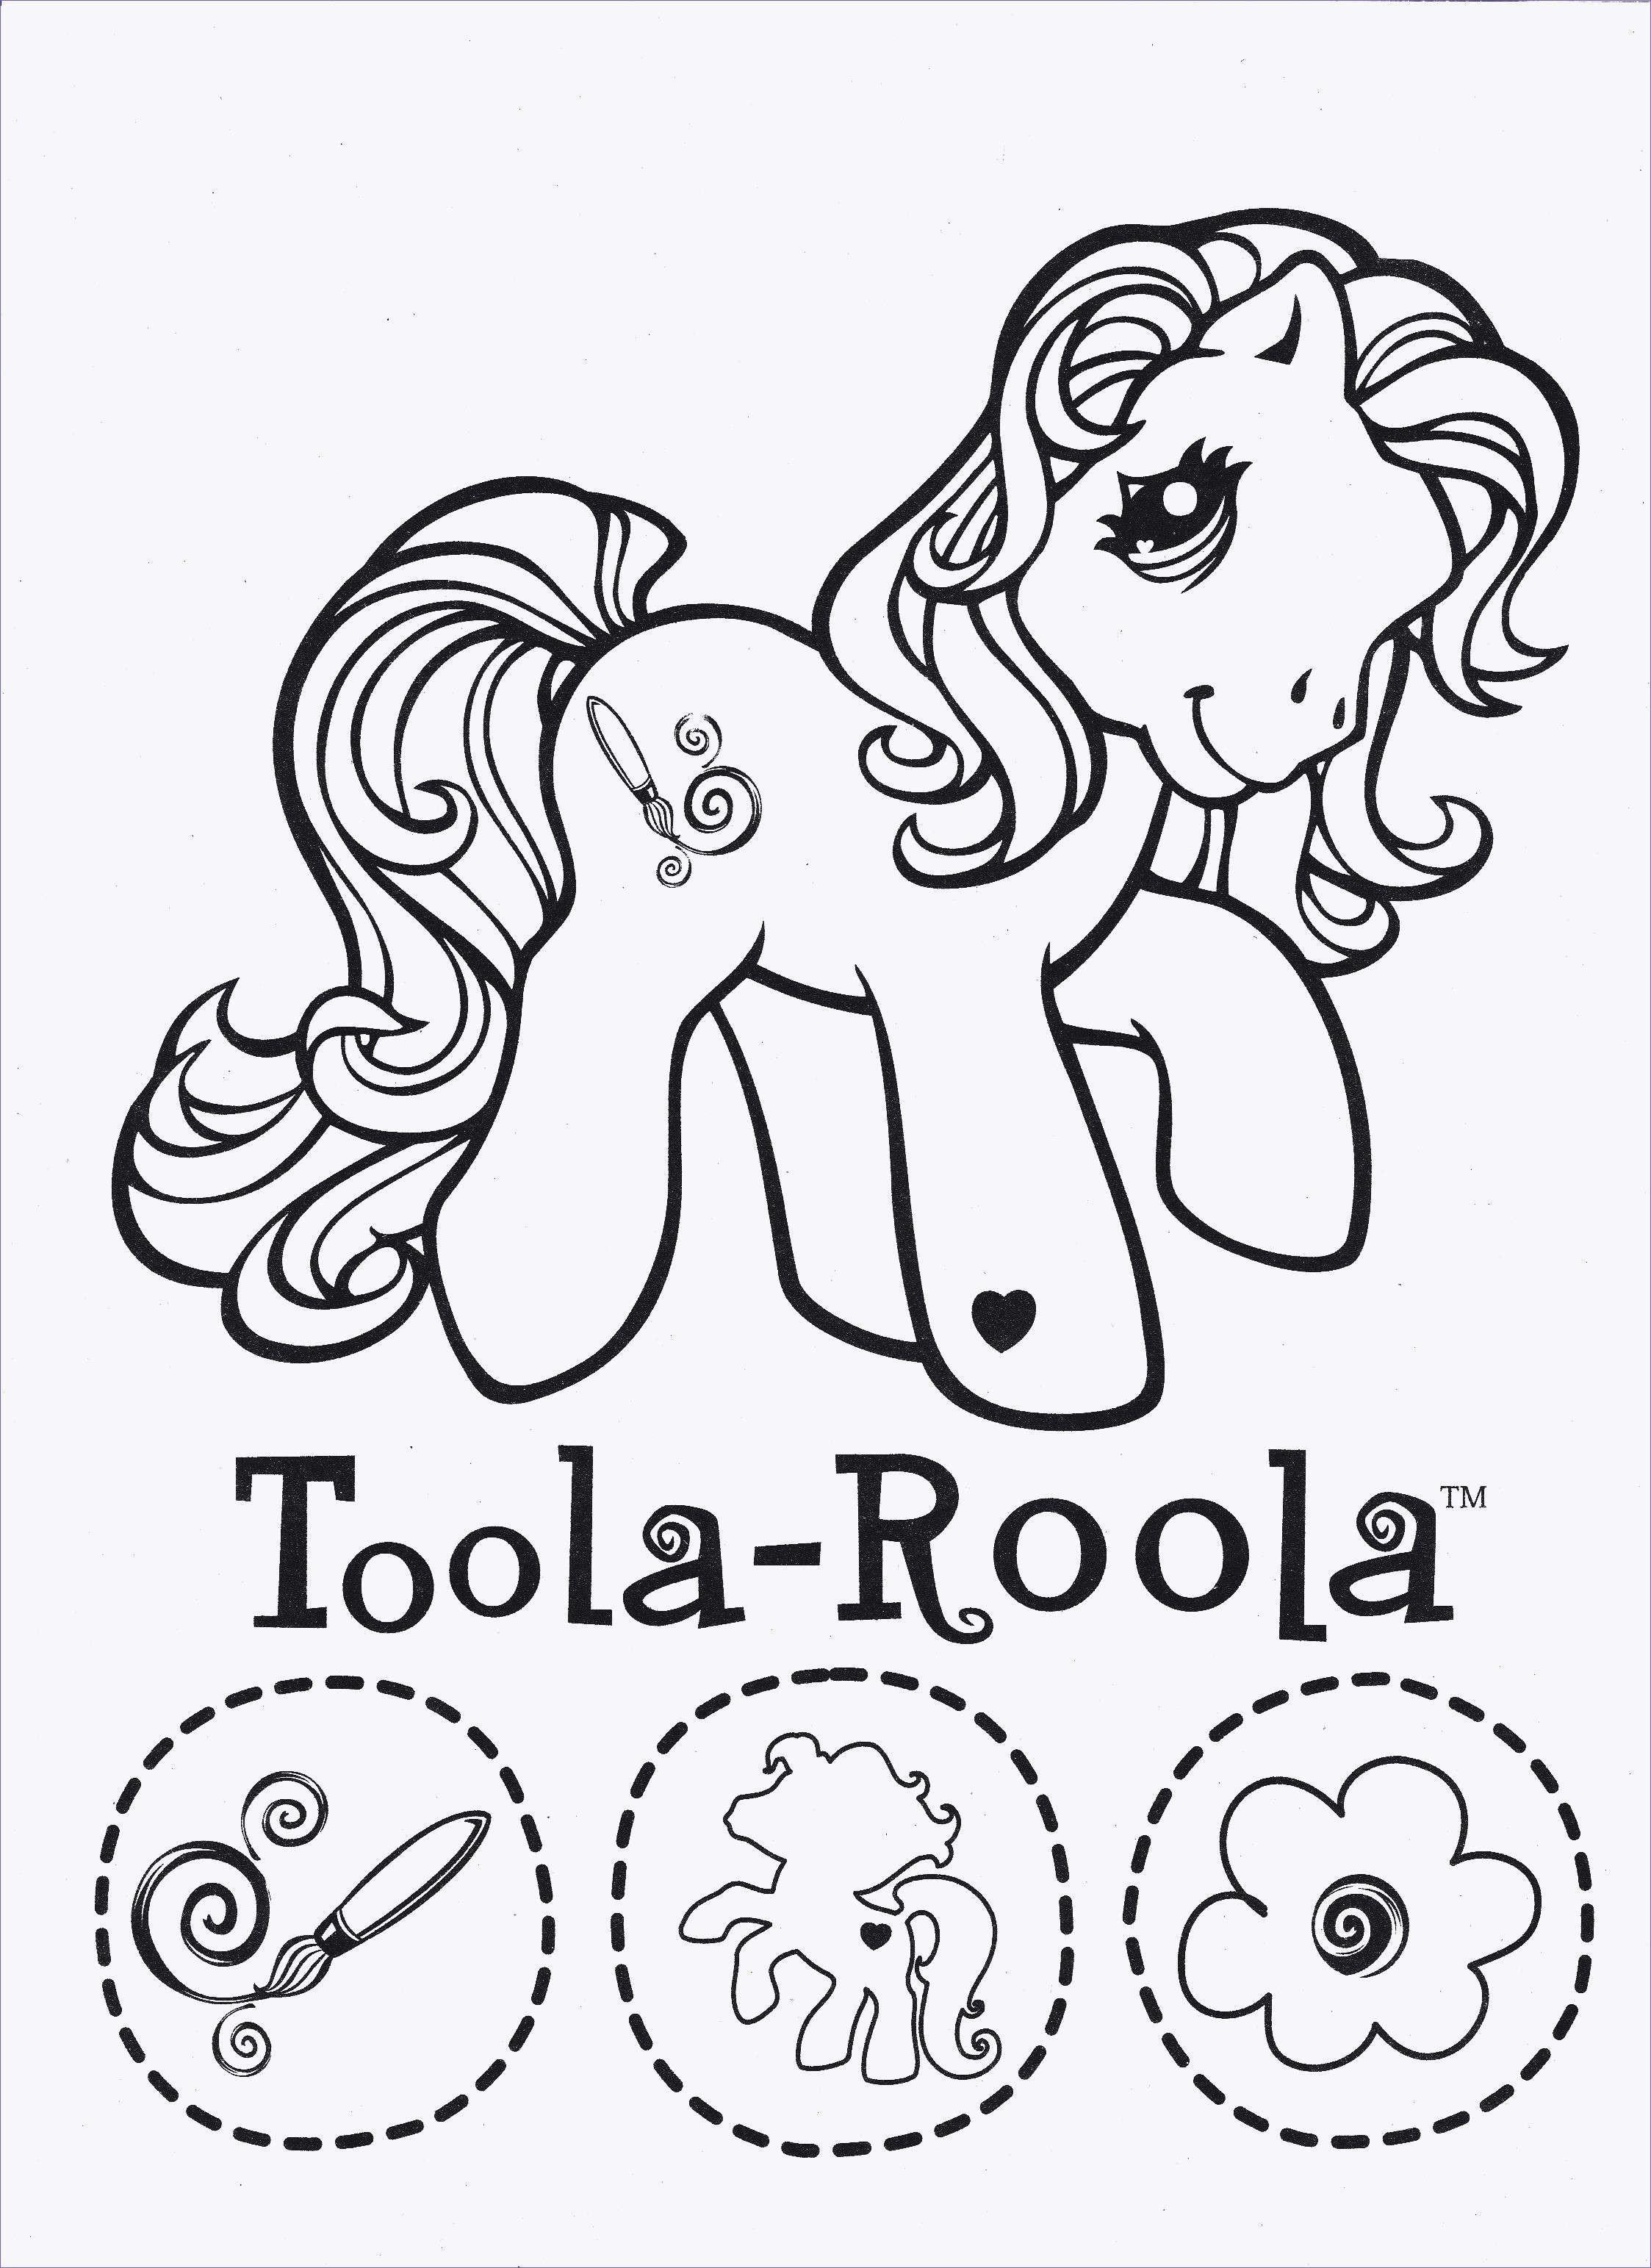 Ausmalbilder My Little Pony Equestria Girl Inspirierend My Little Pony Ausmalbilder Inspirierend Equestria Girl Ausmalbilder Stock